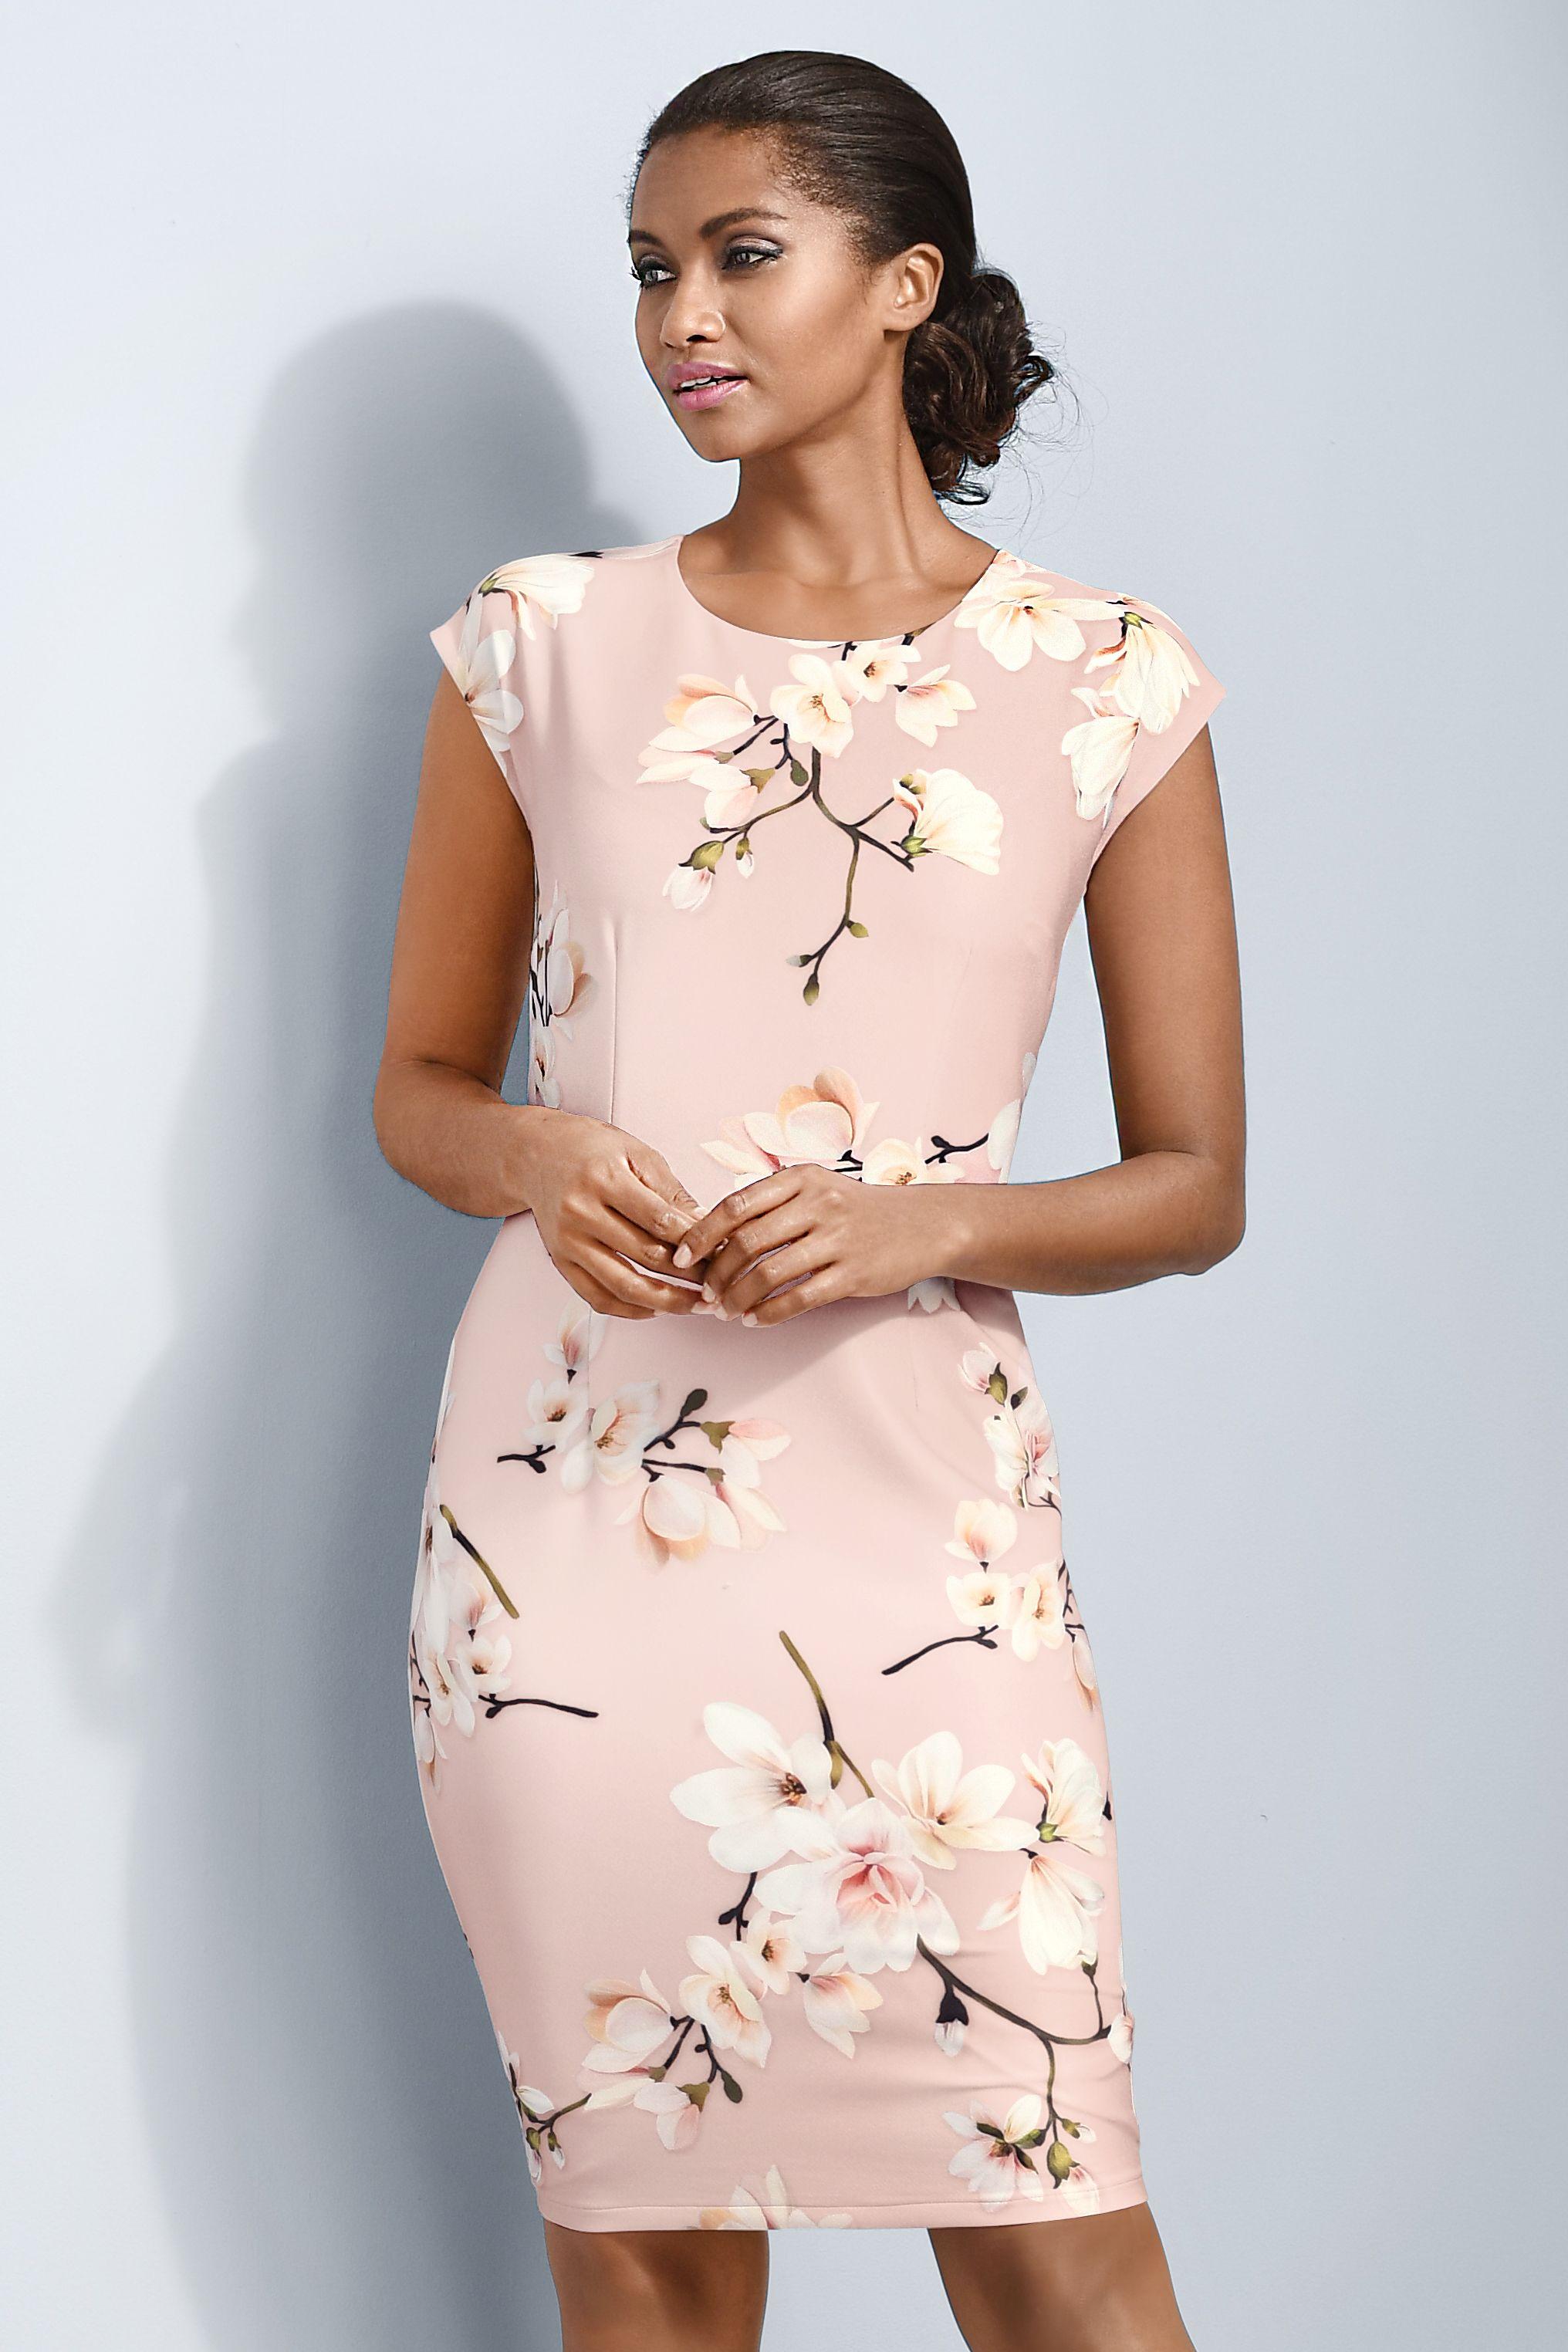 Edles figurbetontes Alba Moda Kleid im floralen Dessin mit